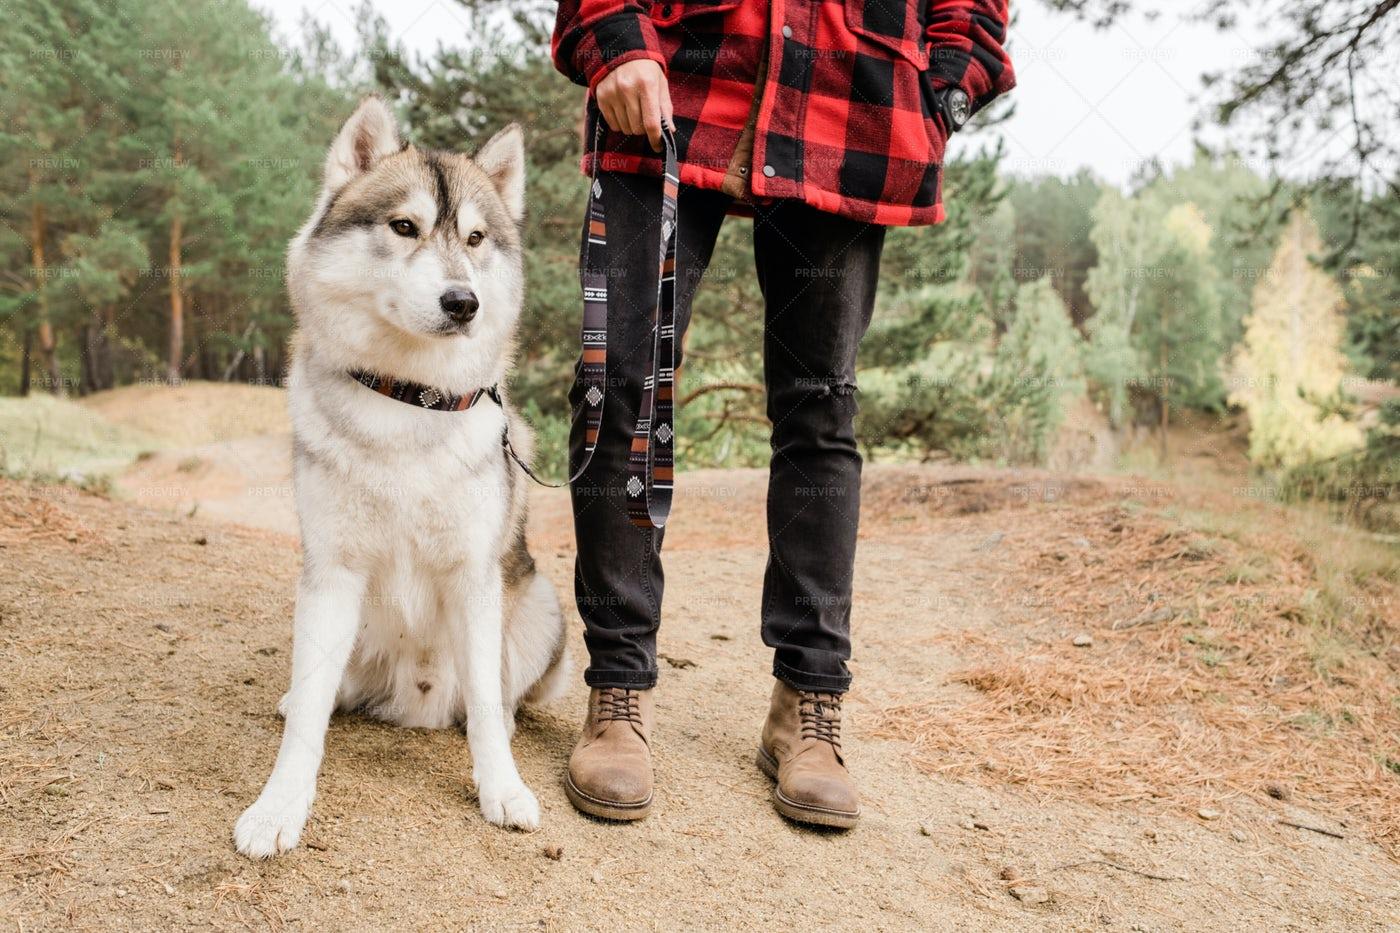 Purebred Husky Dog Sitting On...: Stock Photos